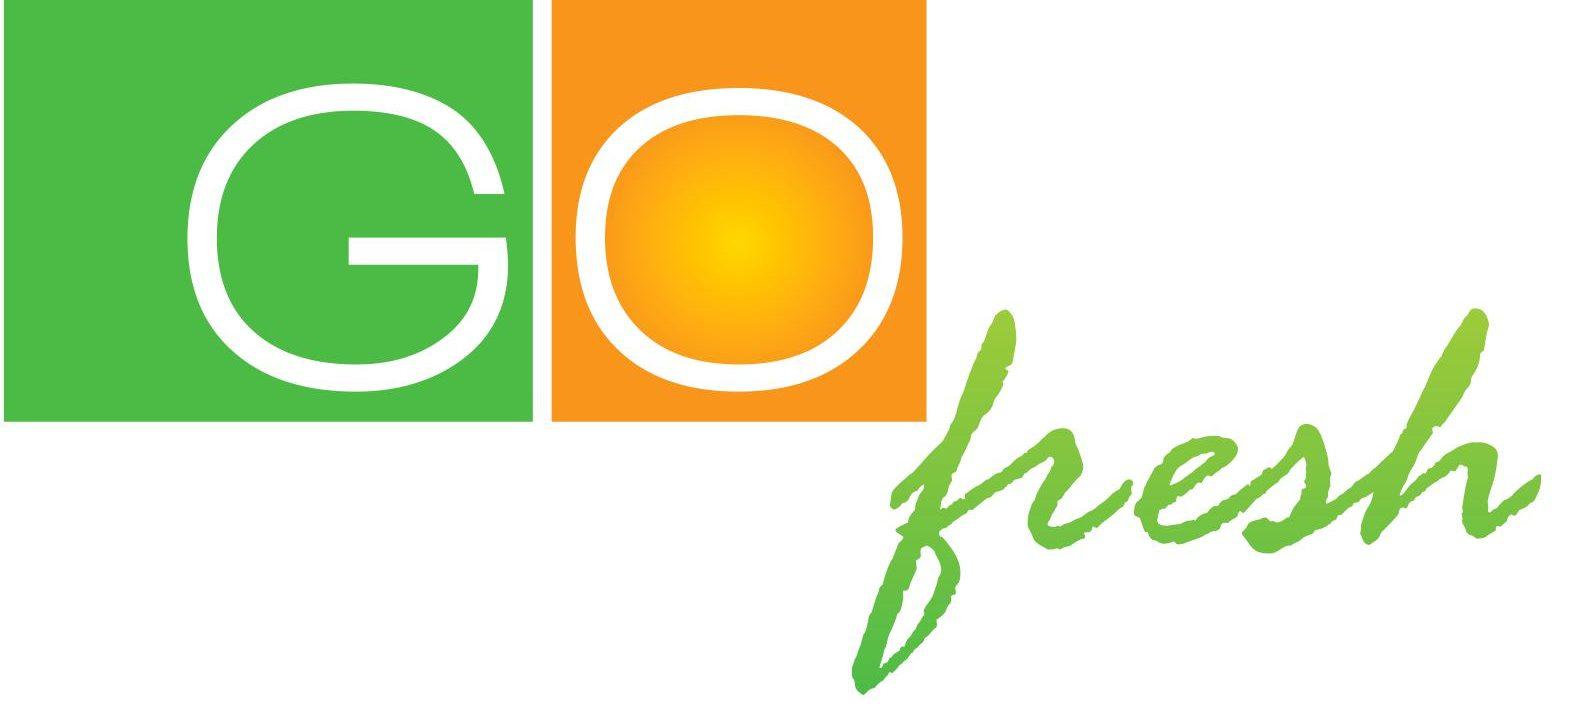 Go-fresh